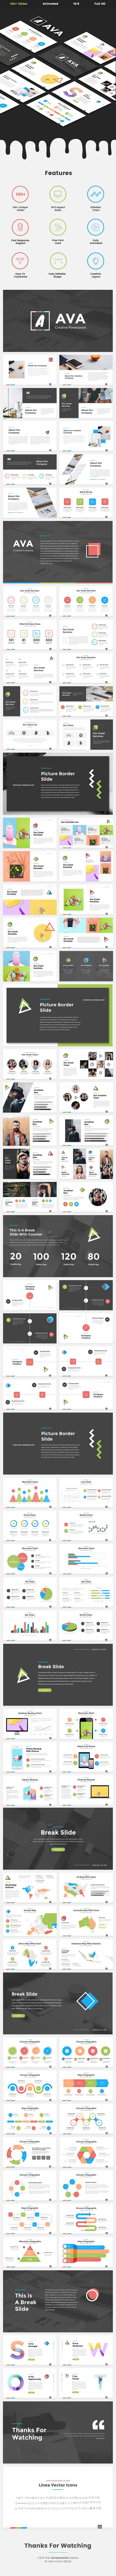 Ava - Creative Google Slides Template - Google Slides Presentation Templates